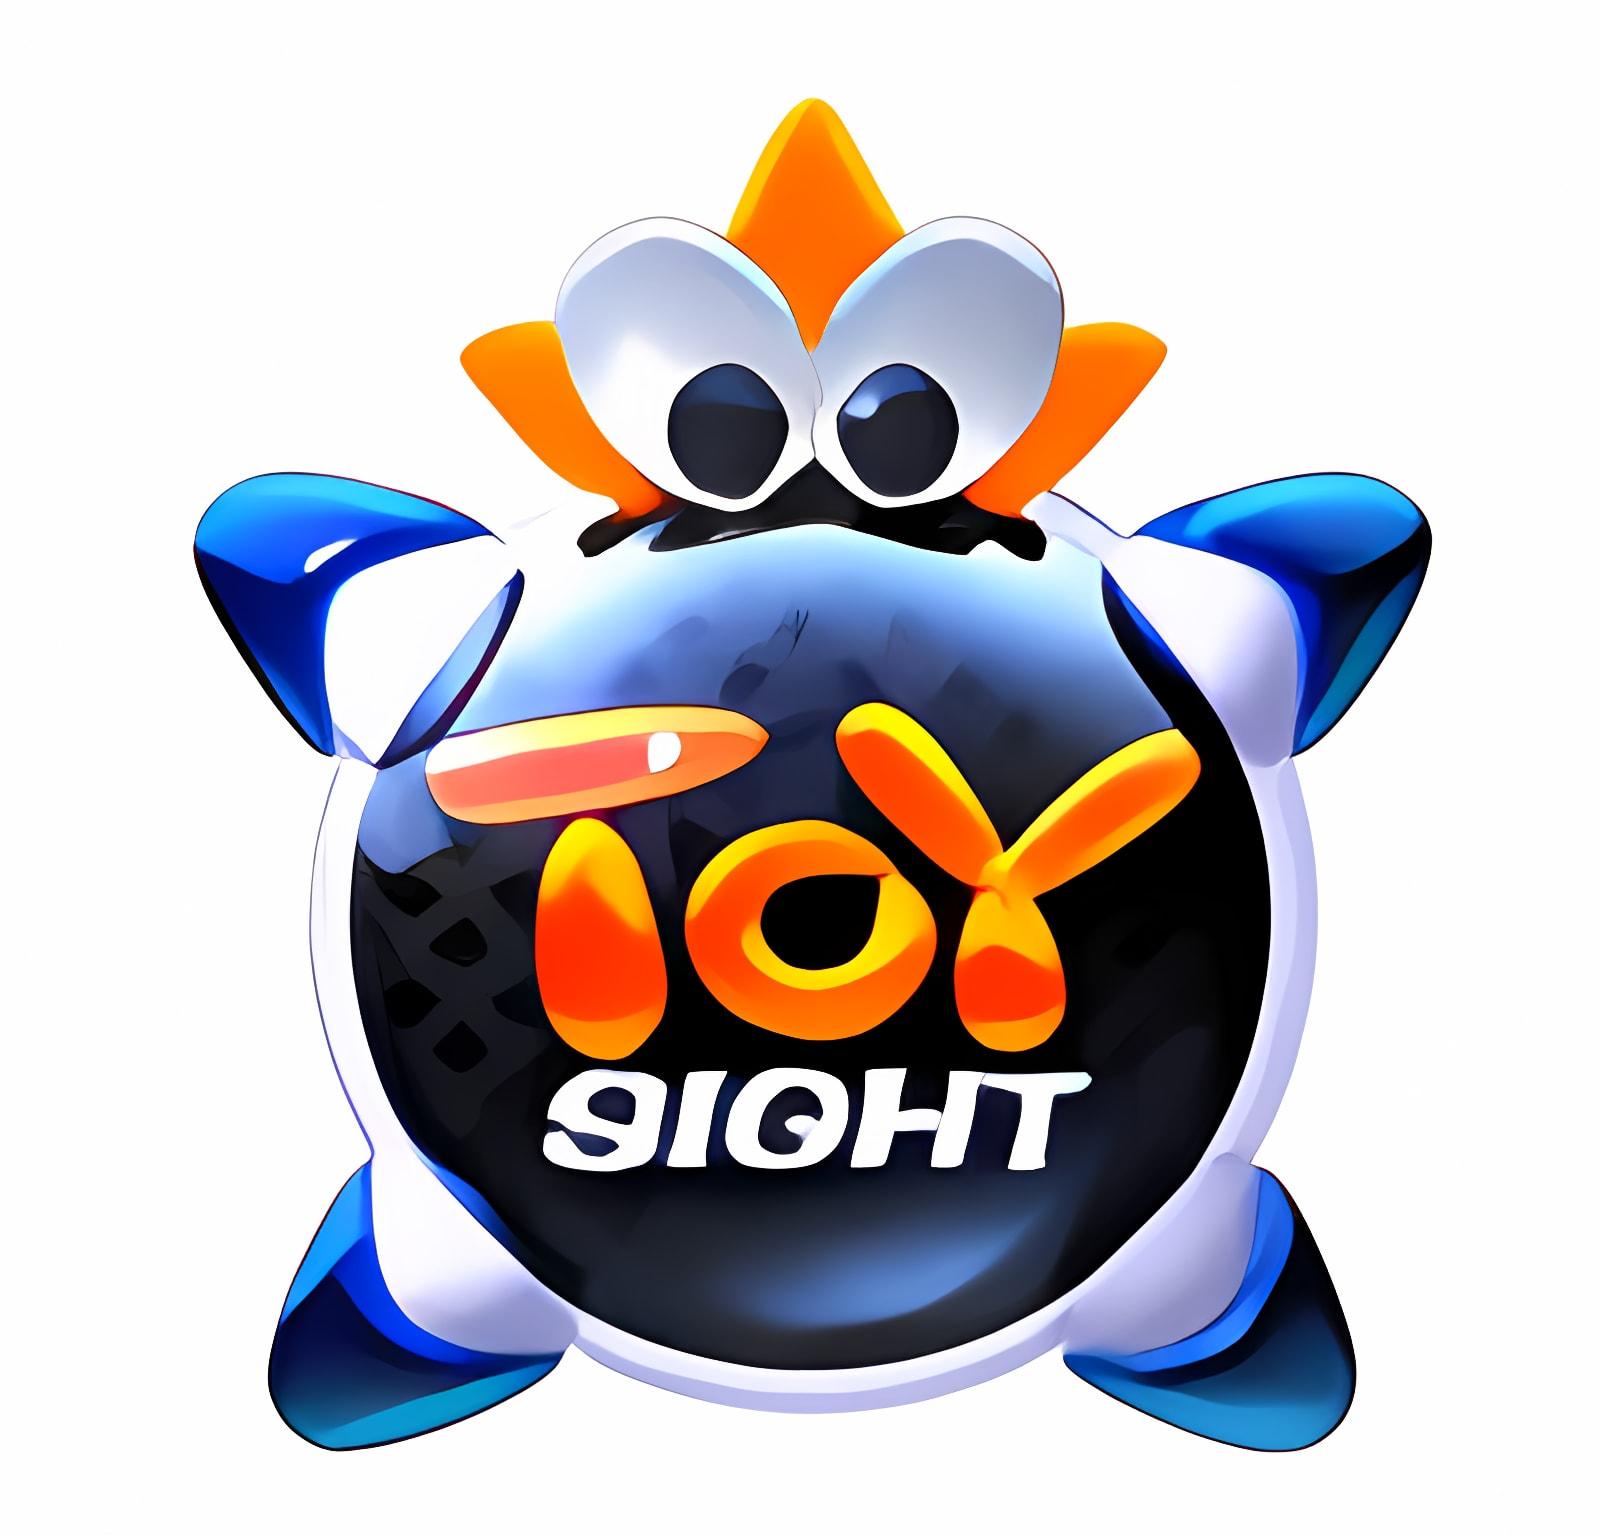 ToySight Gold